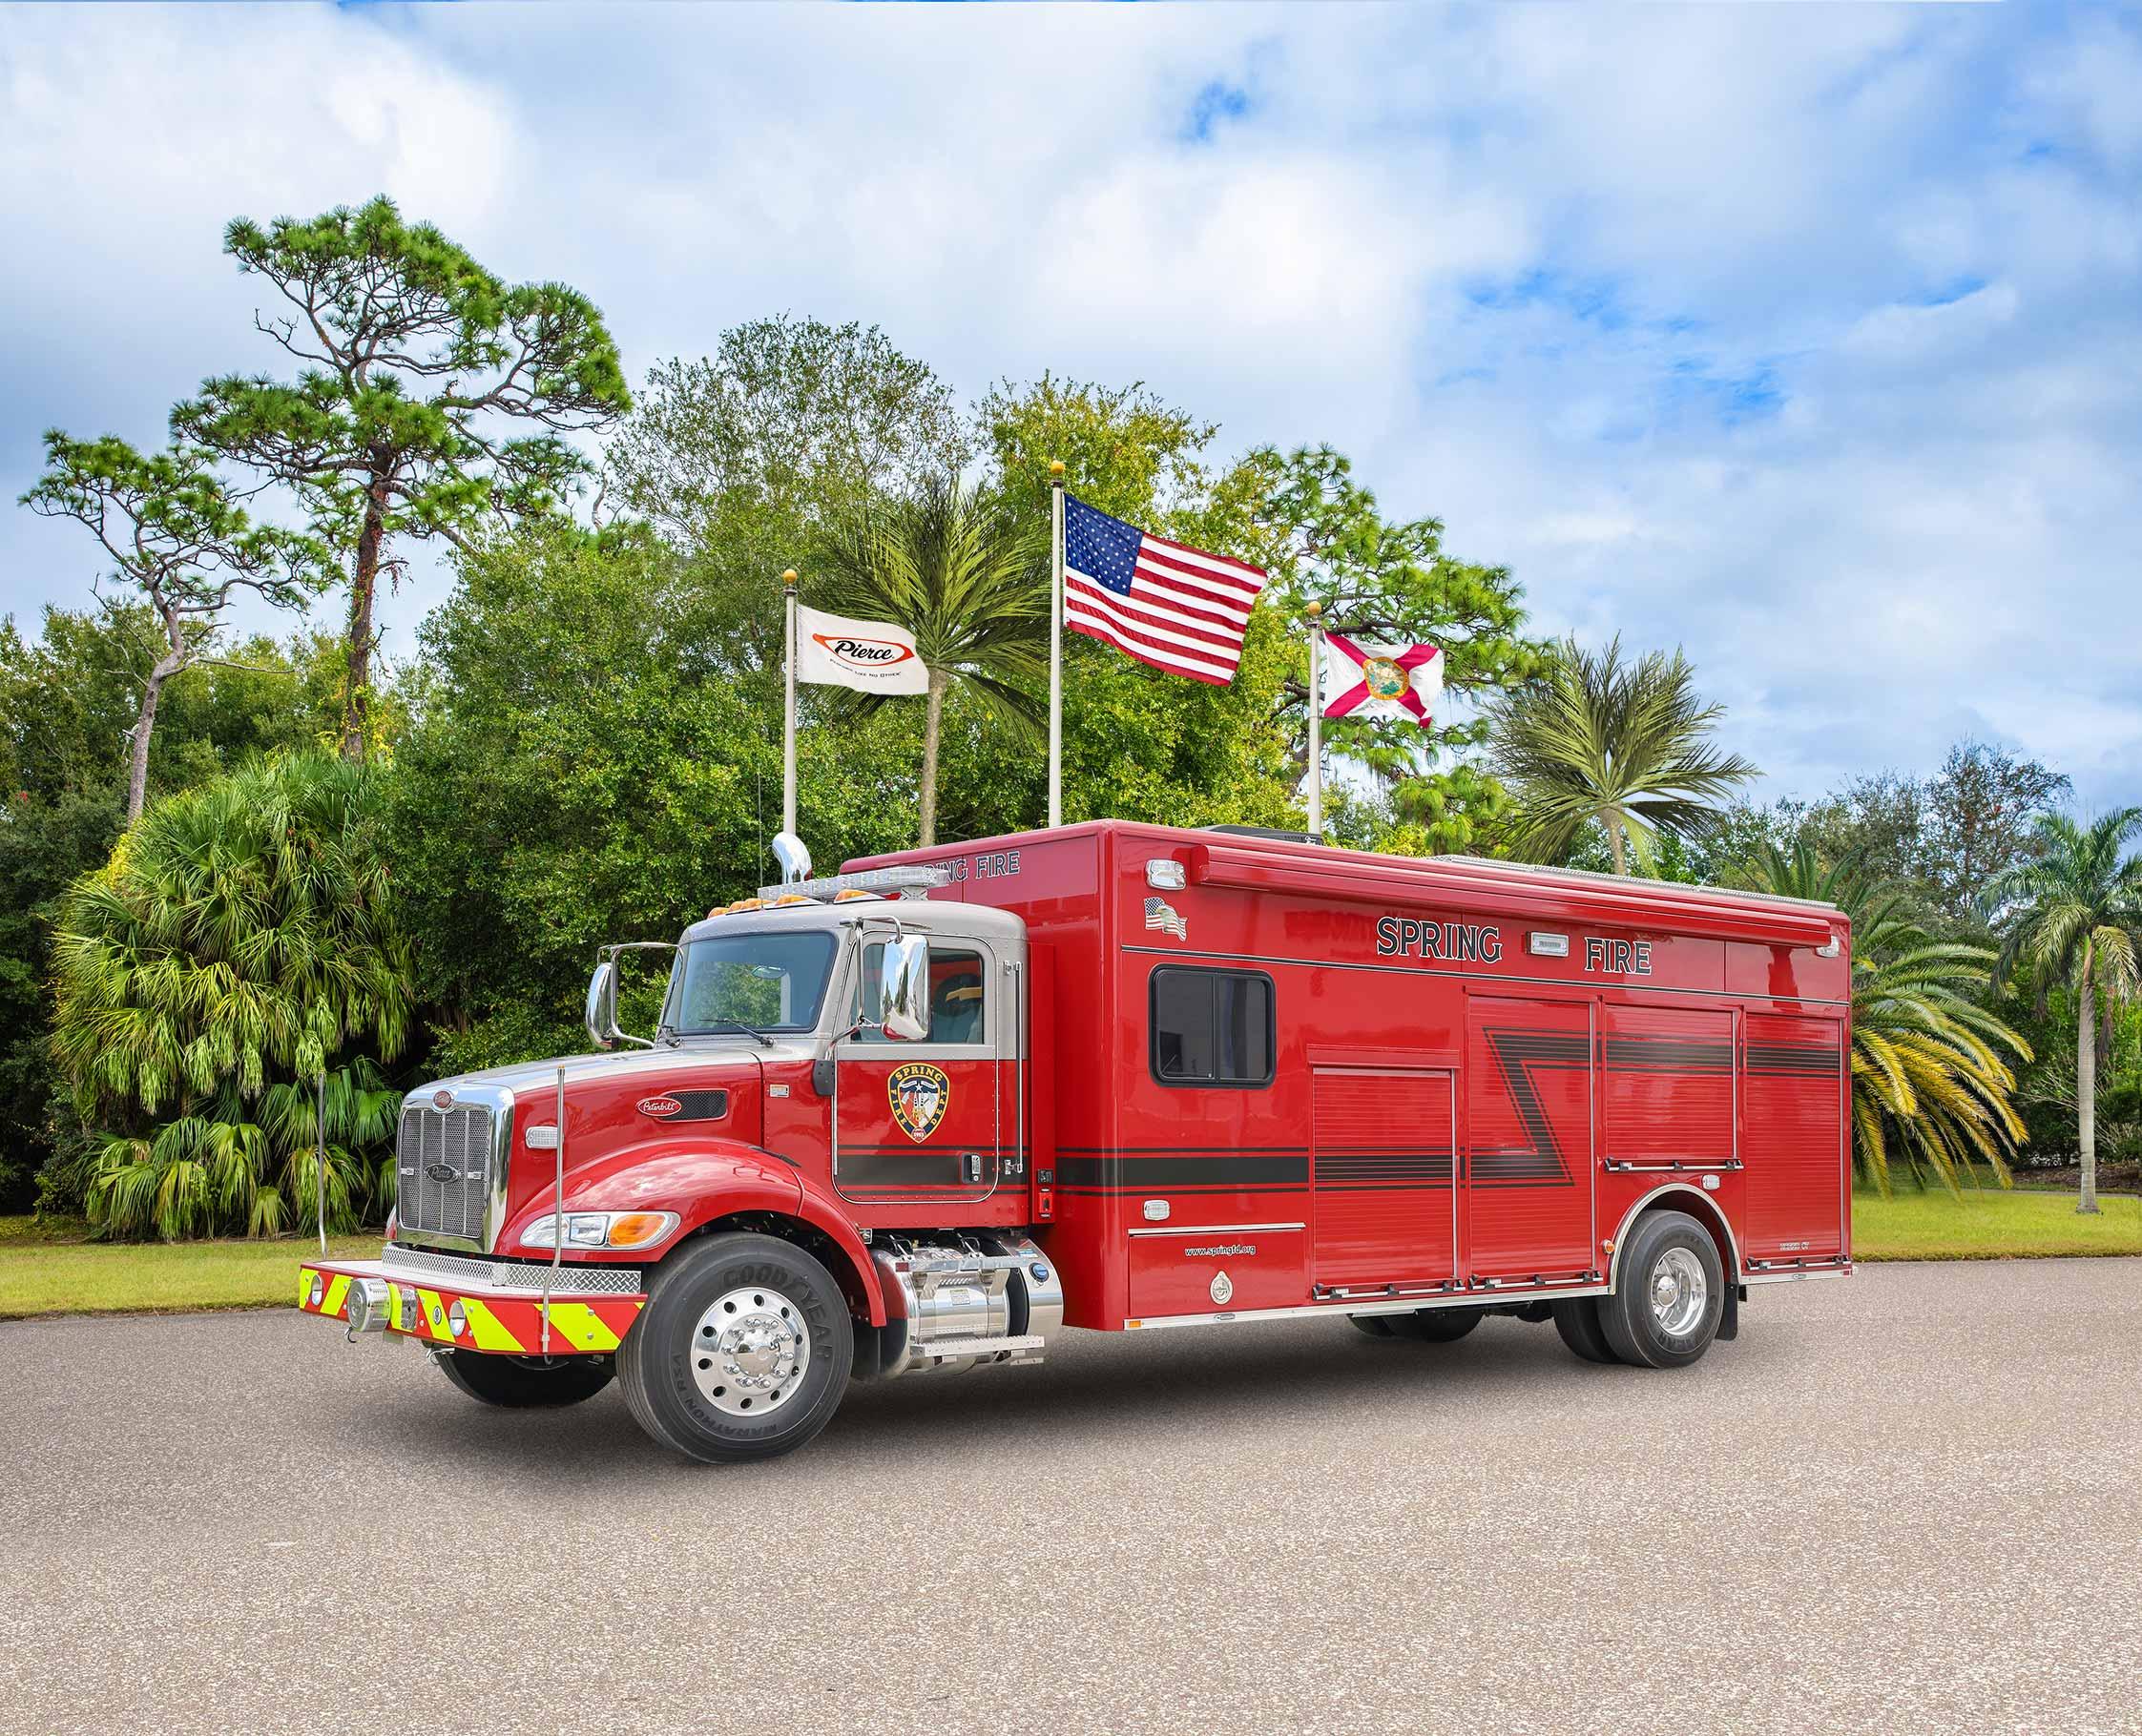 Harris County - Rescue